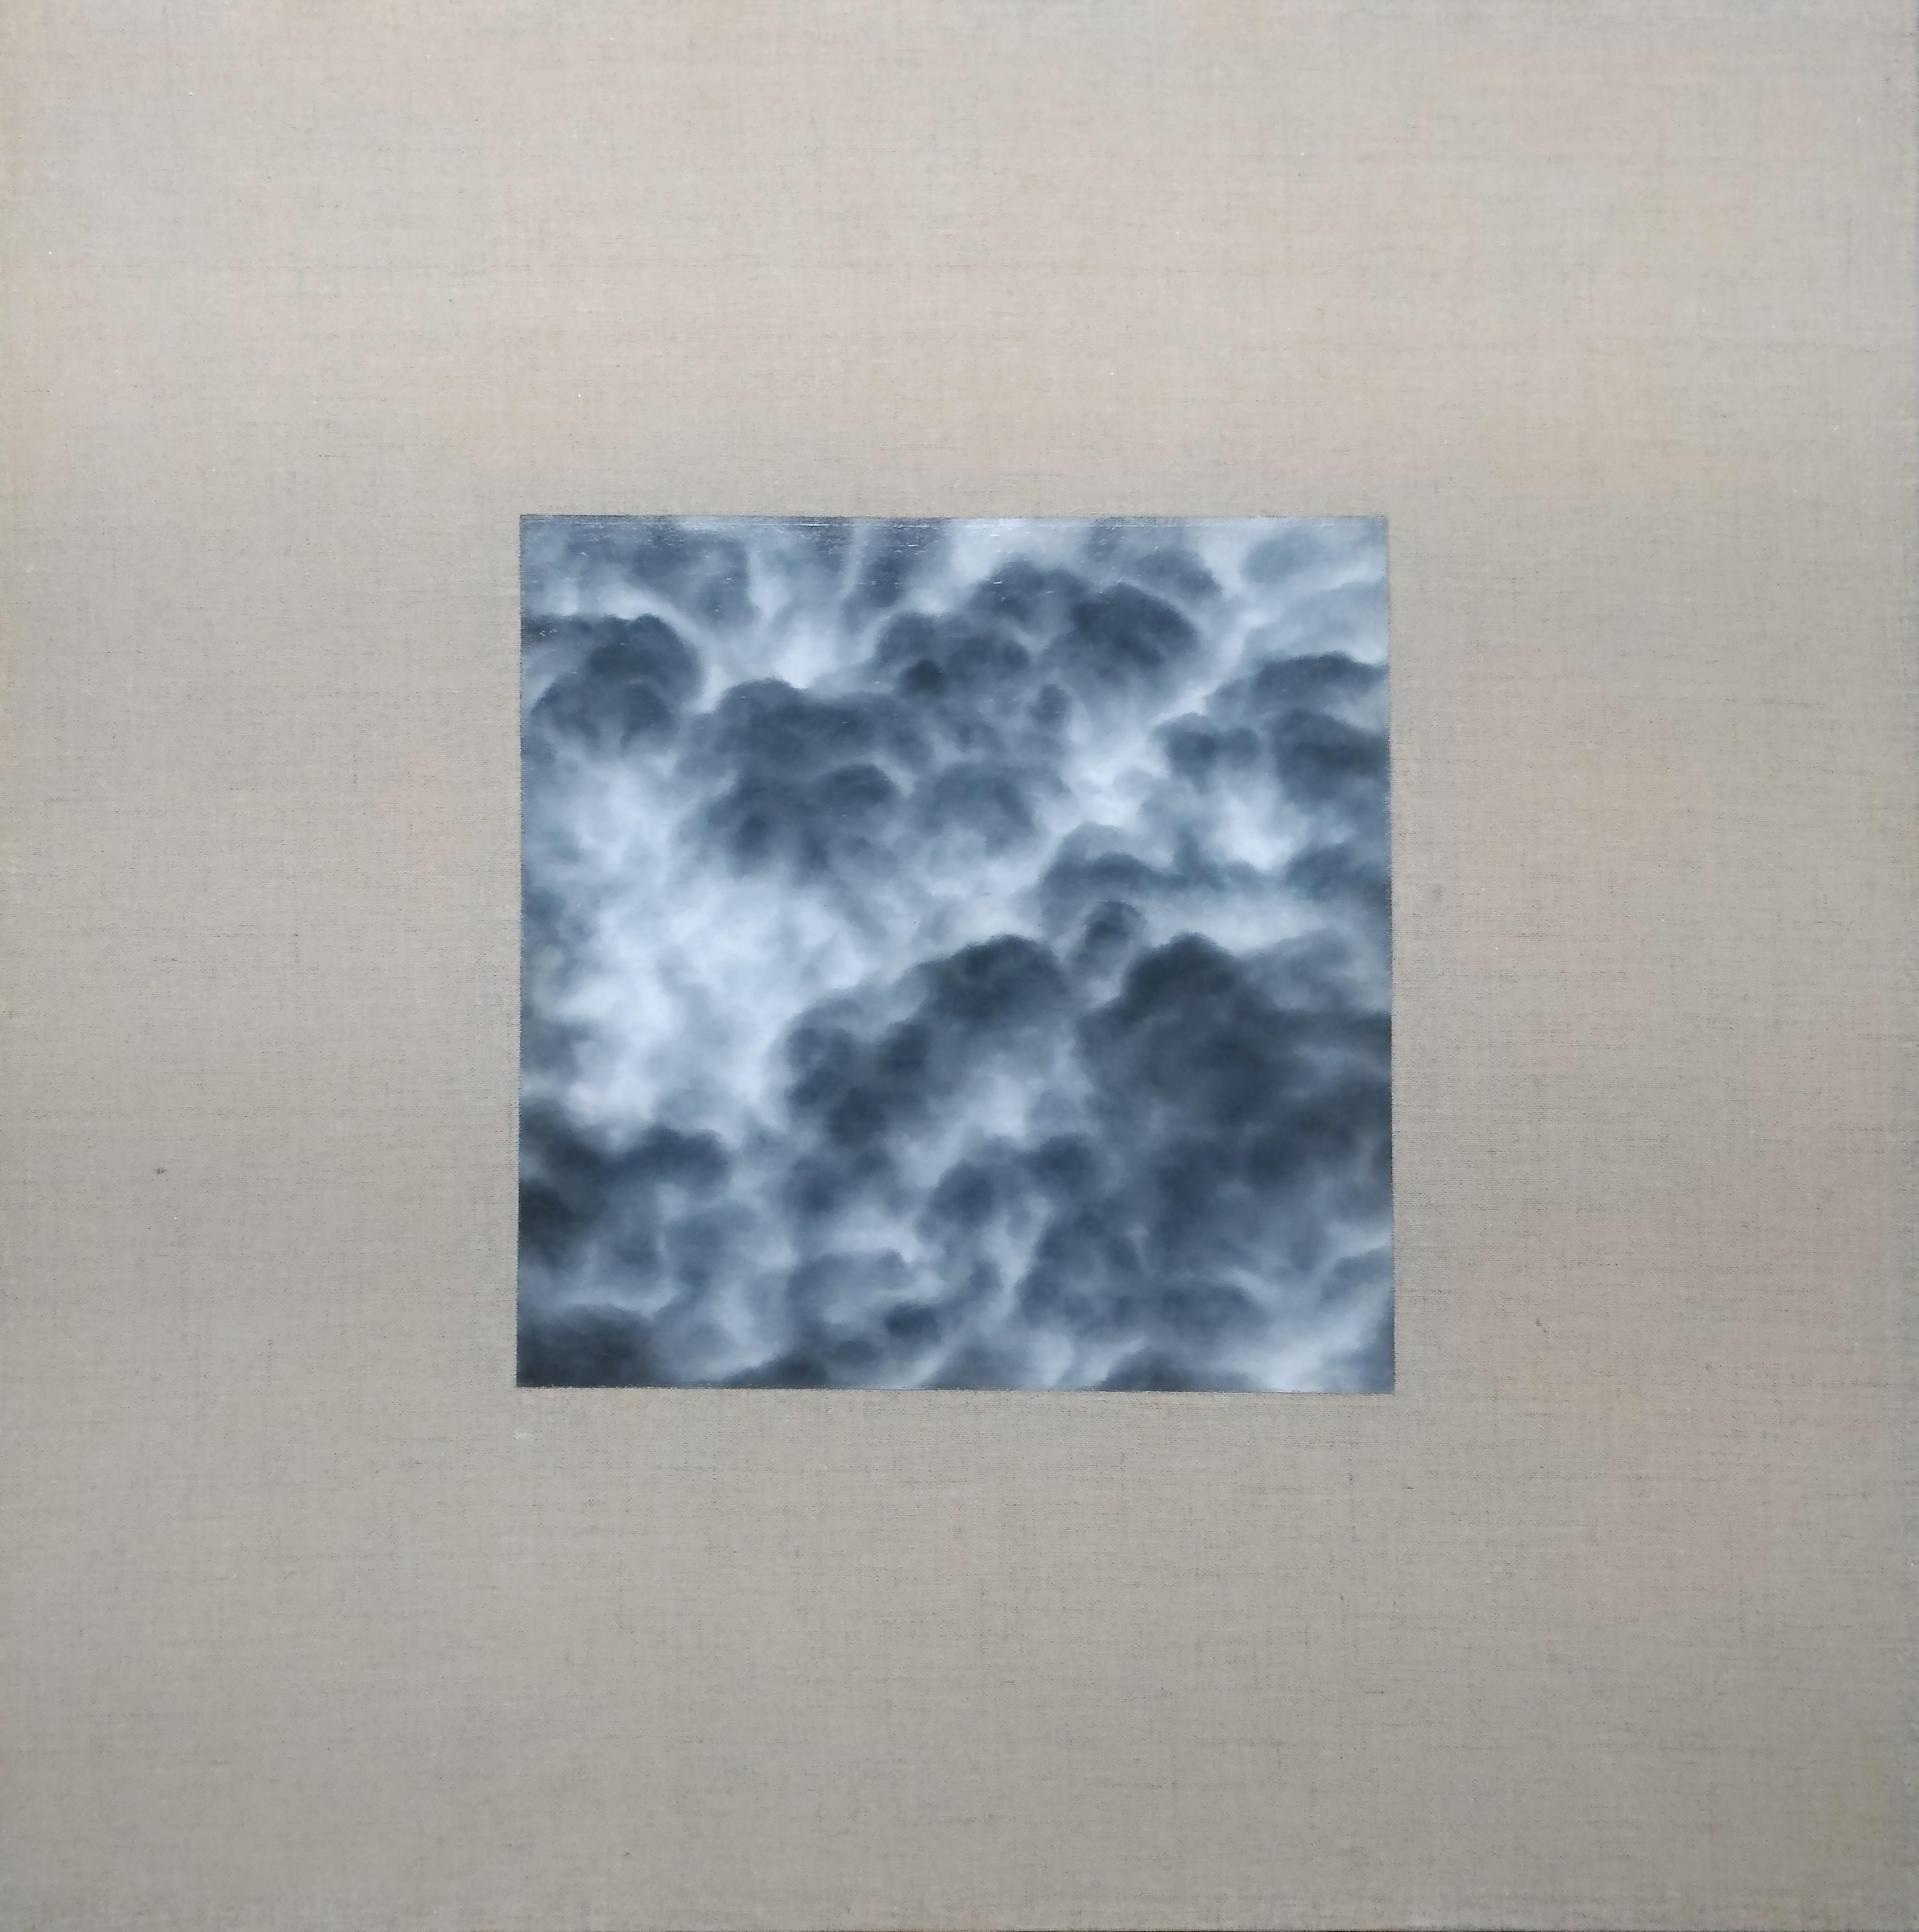 雲的前景 I